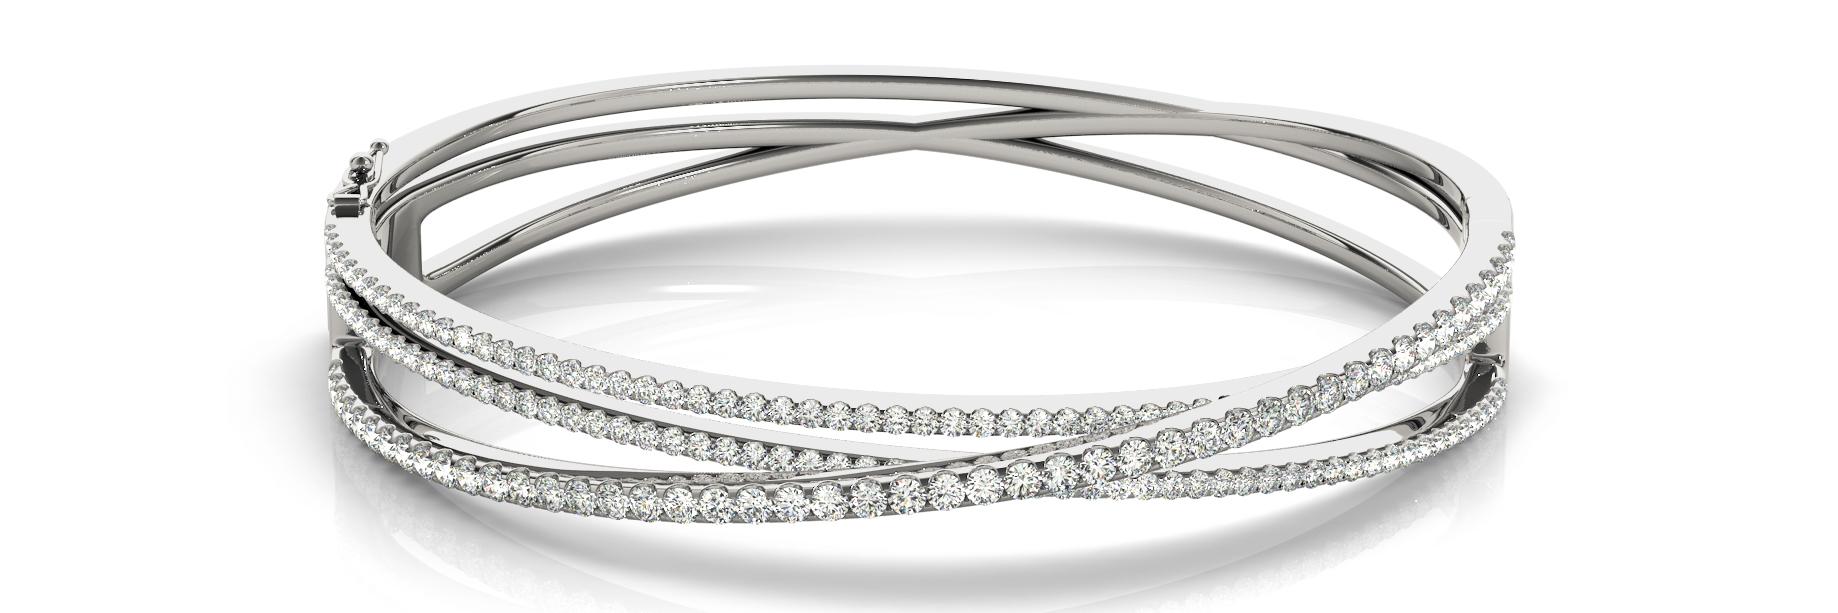 White Gold Tri-Strand Open Diamond Hinged Bangle Bracelet